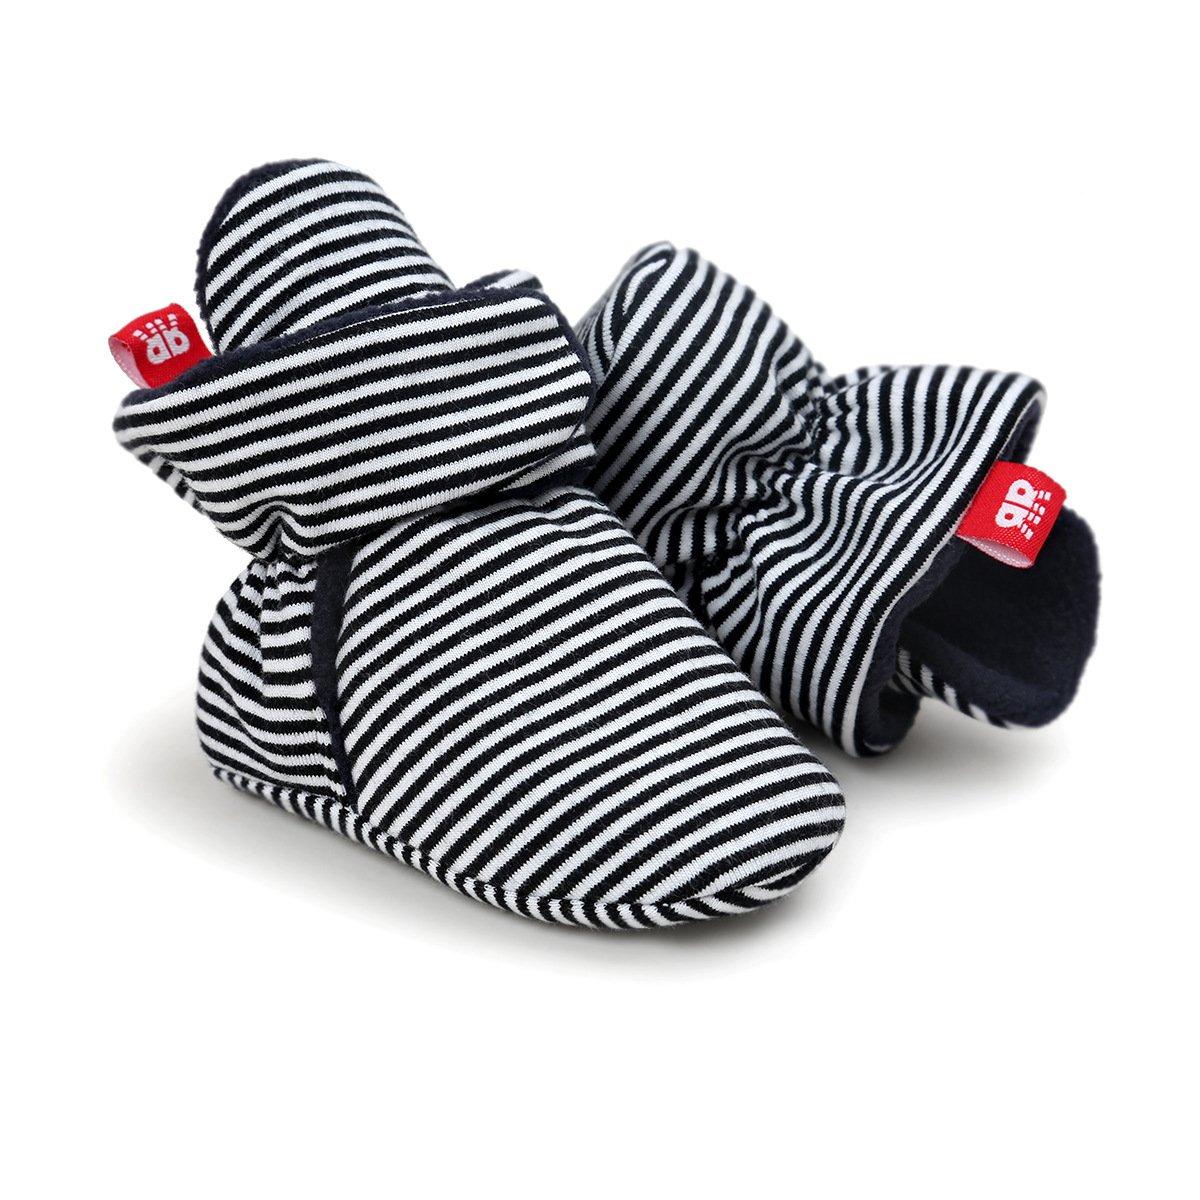 Adorel Baby Toddlers Fleece Booties Crib Shoes Winter